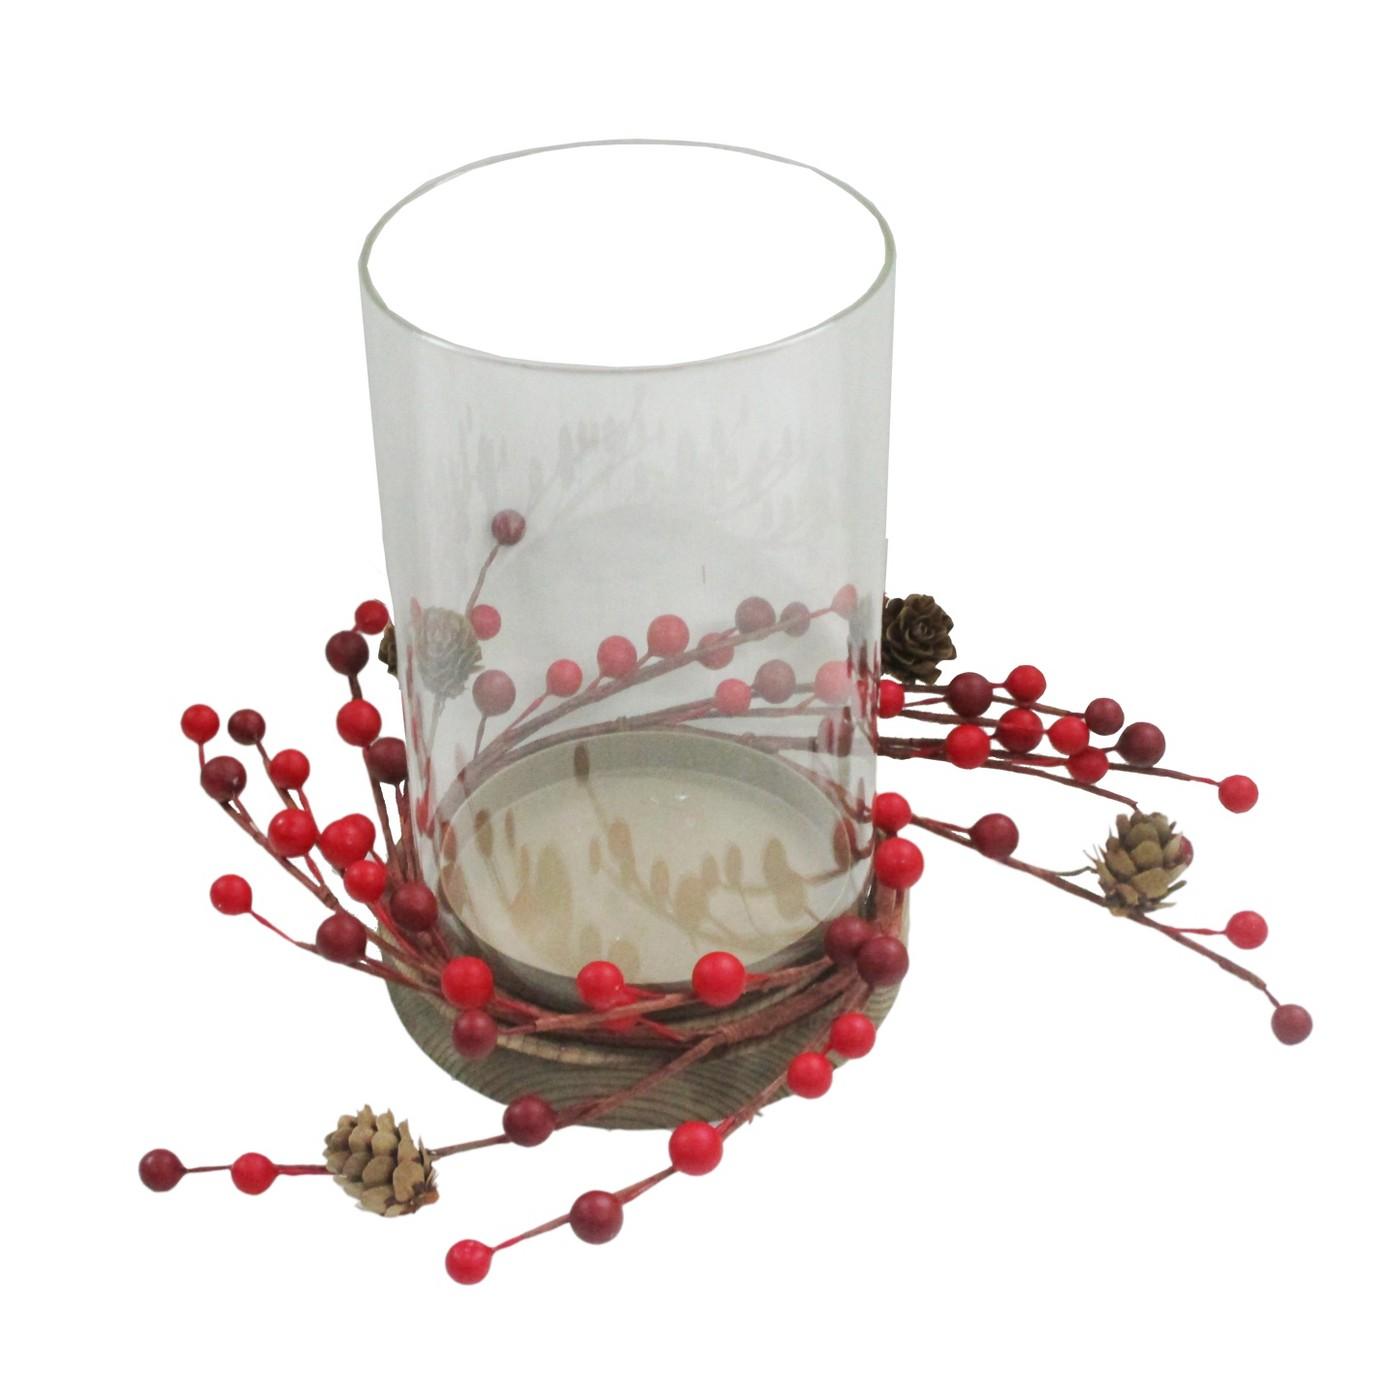 Glass Candle Vase with Berries - Wondershop™ - image 1 of 1